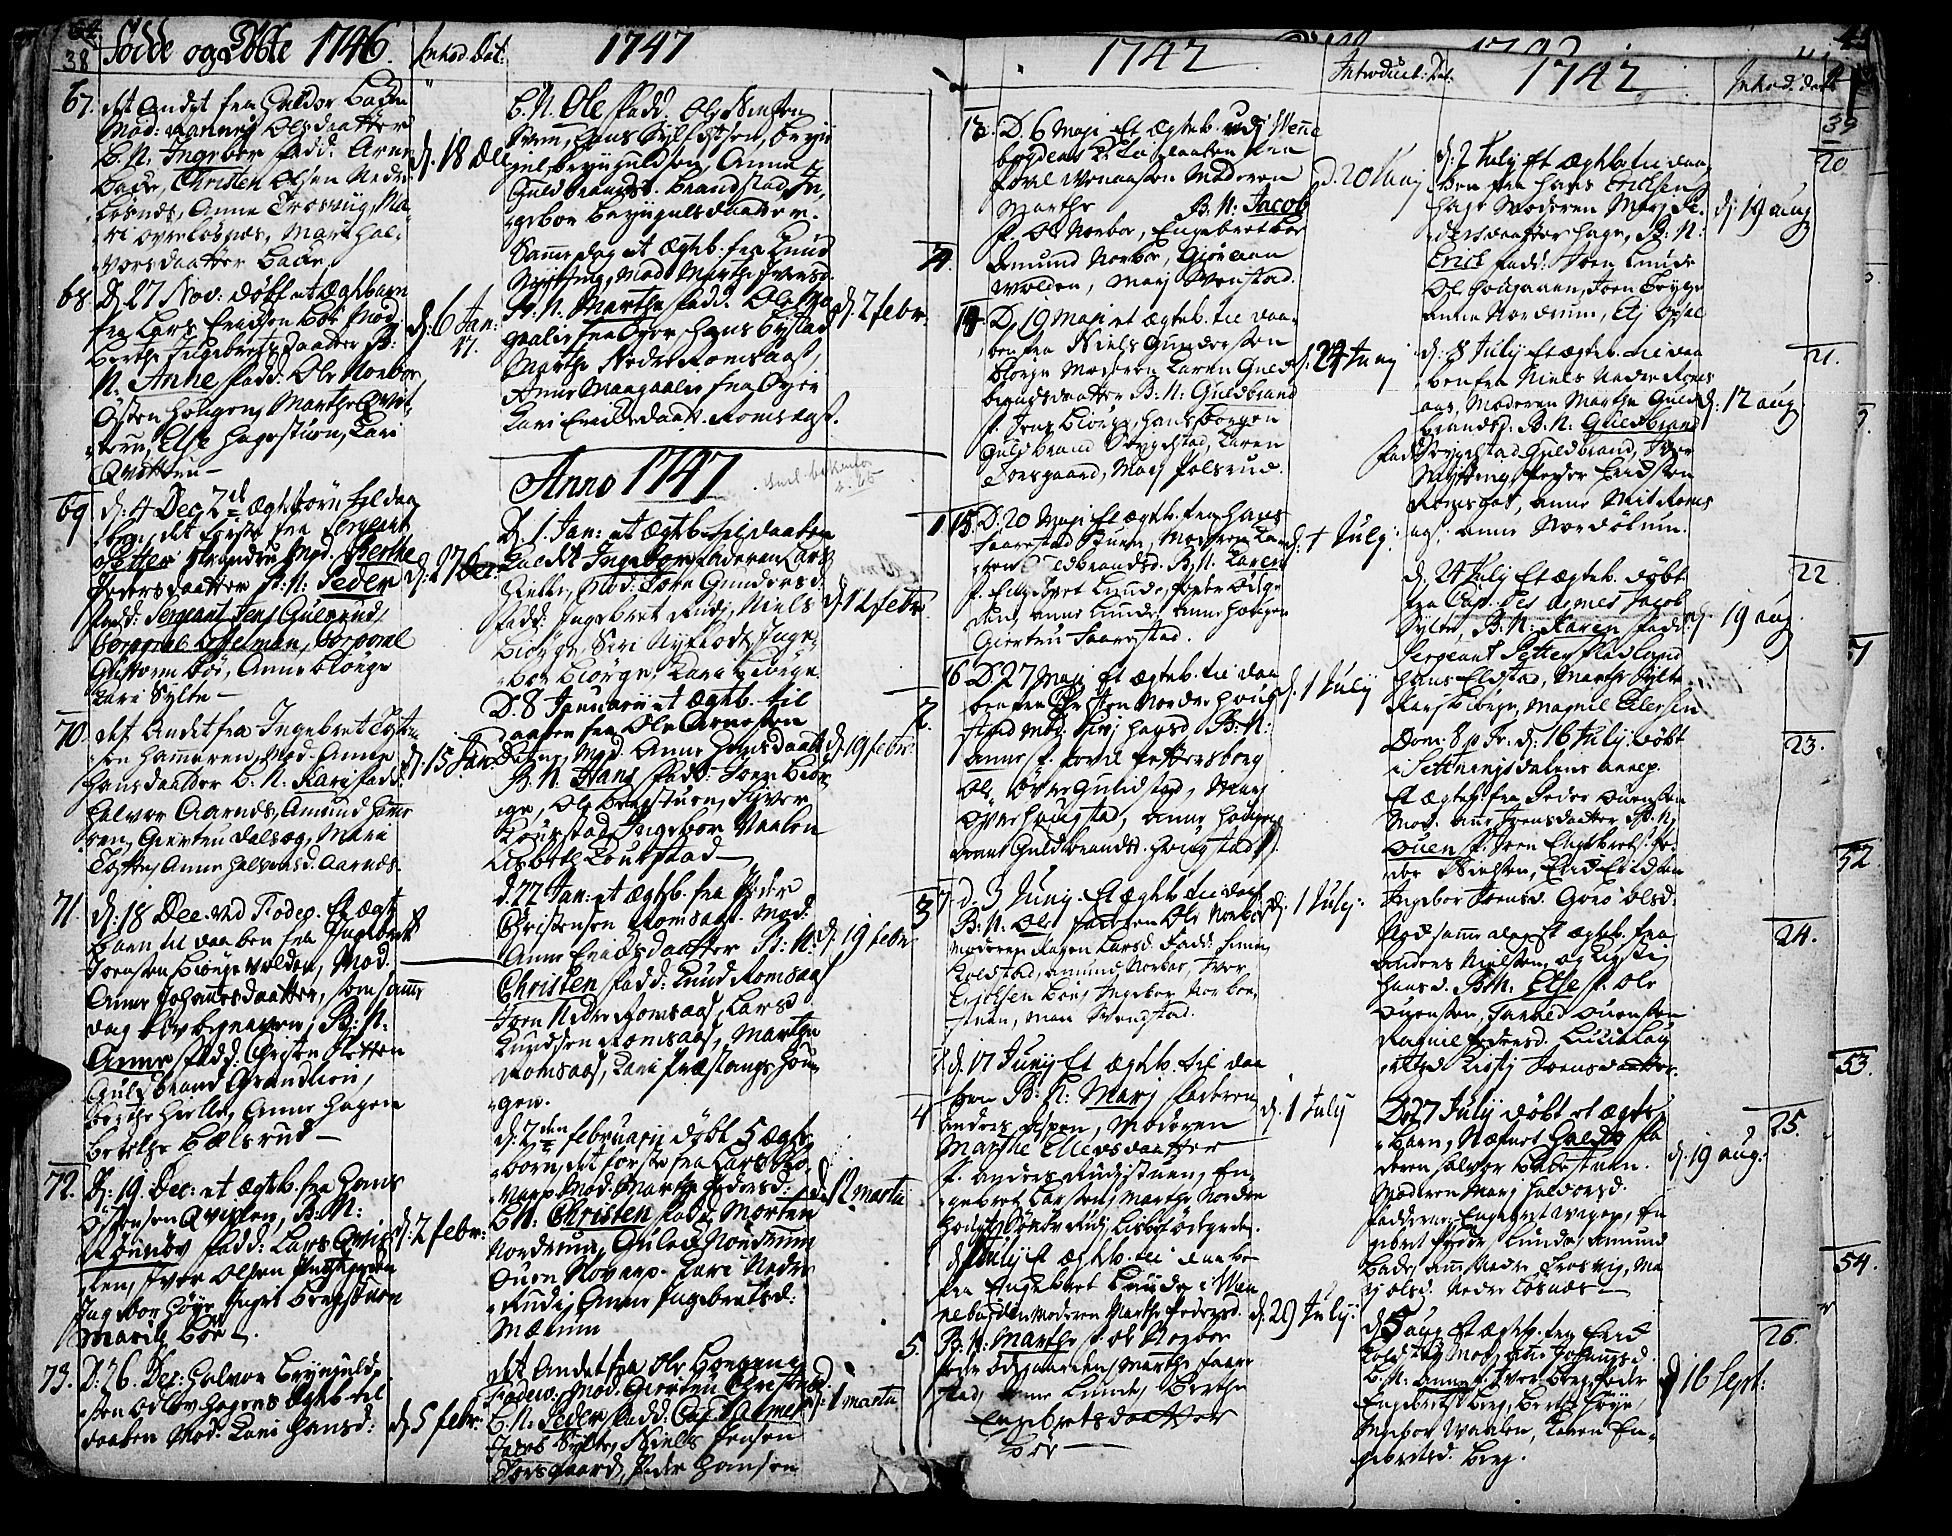 SAH, Ringebu prestekontor, Ministerialbok nr. 2, 1734-1780, s. 38-39